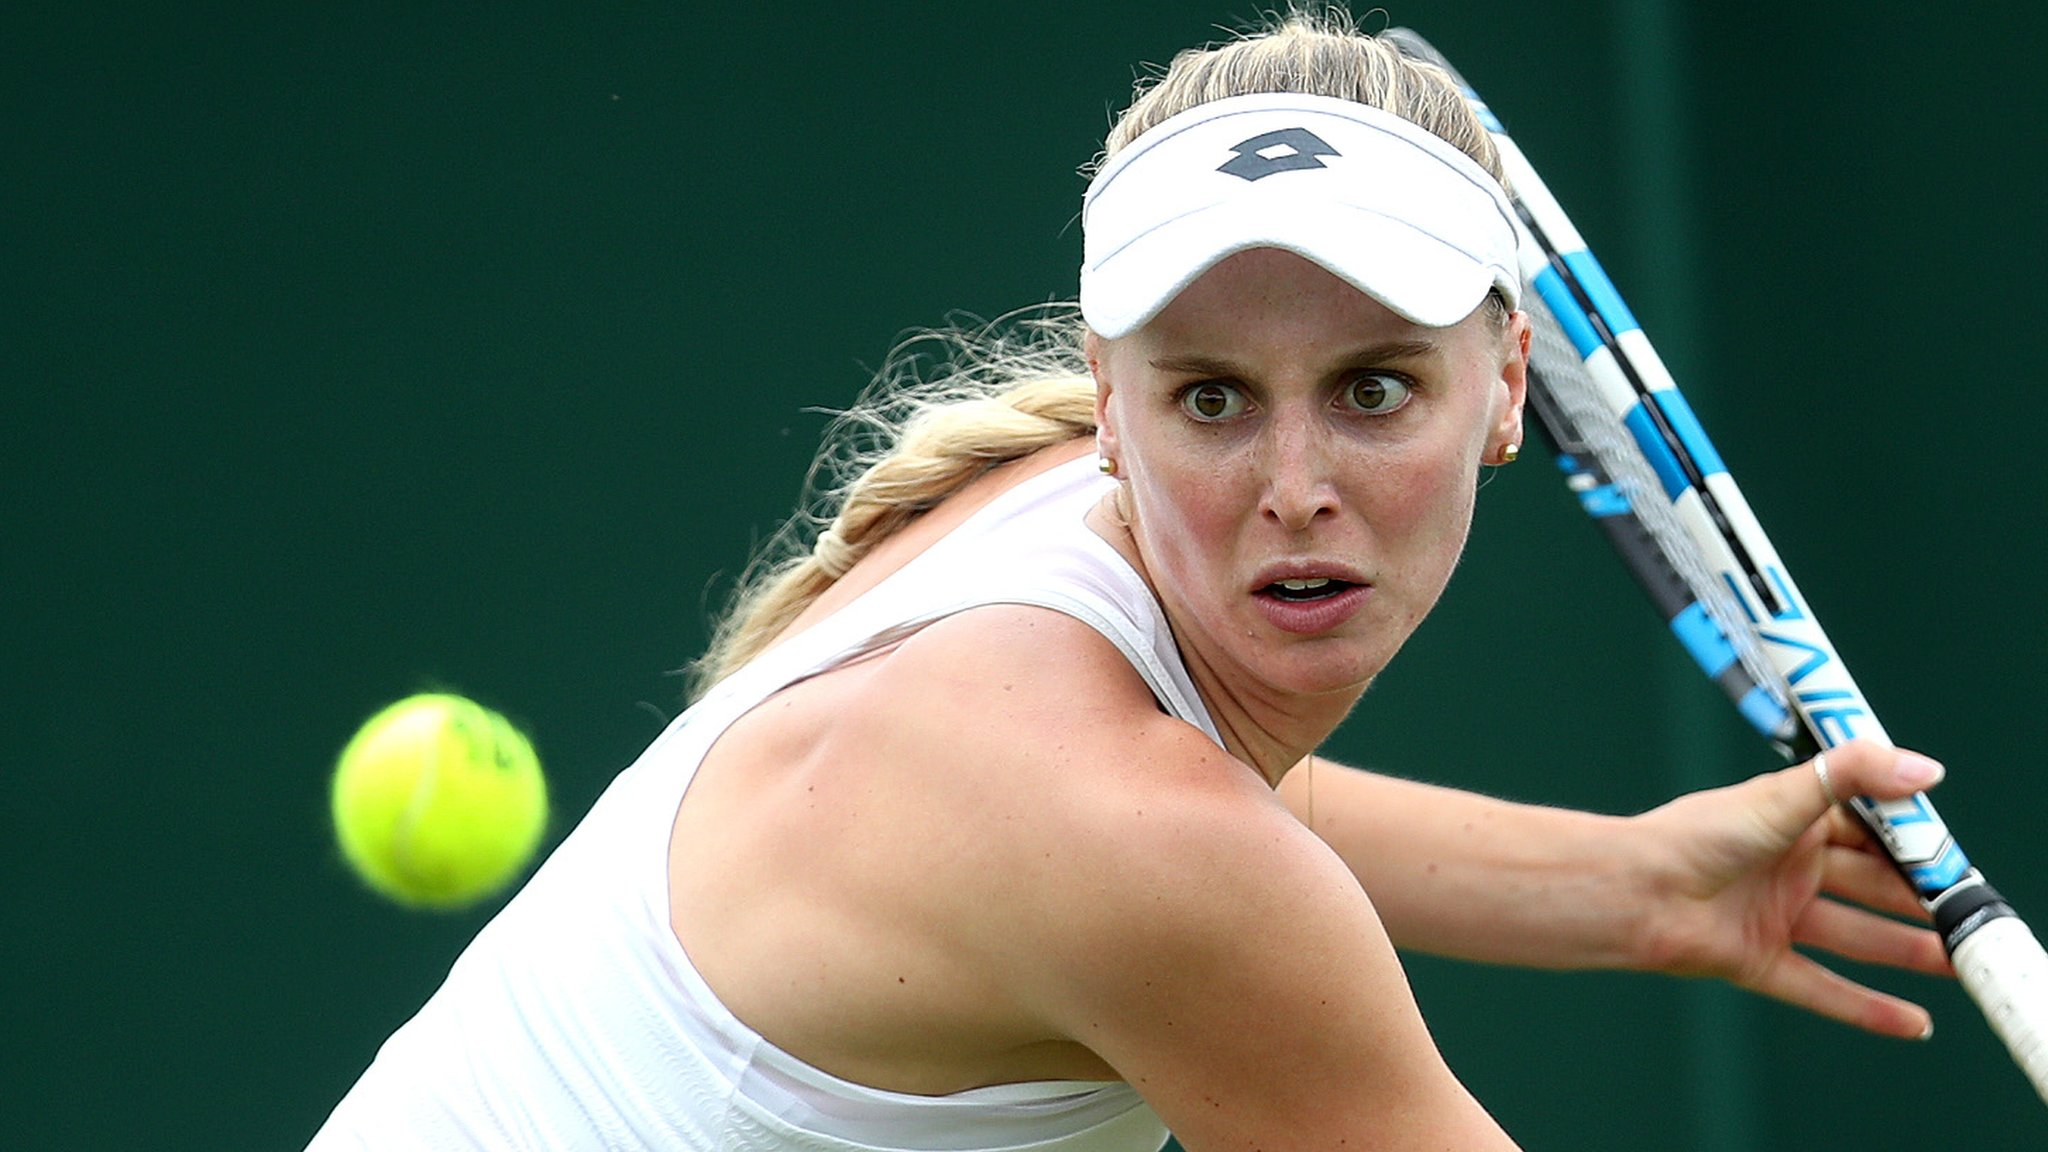 Wimbledon qualifying 2019: Naomi Broady out, but Samantha Murray and Gabriella Taylor through